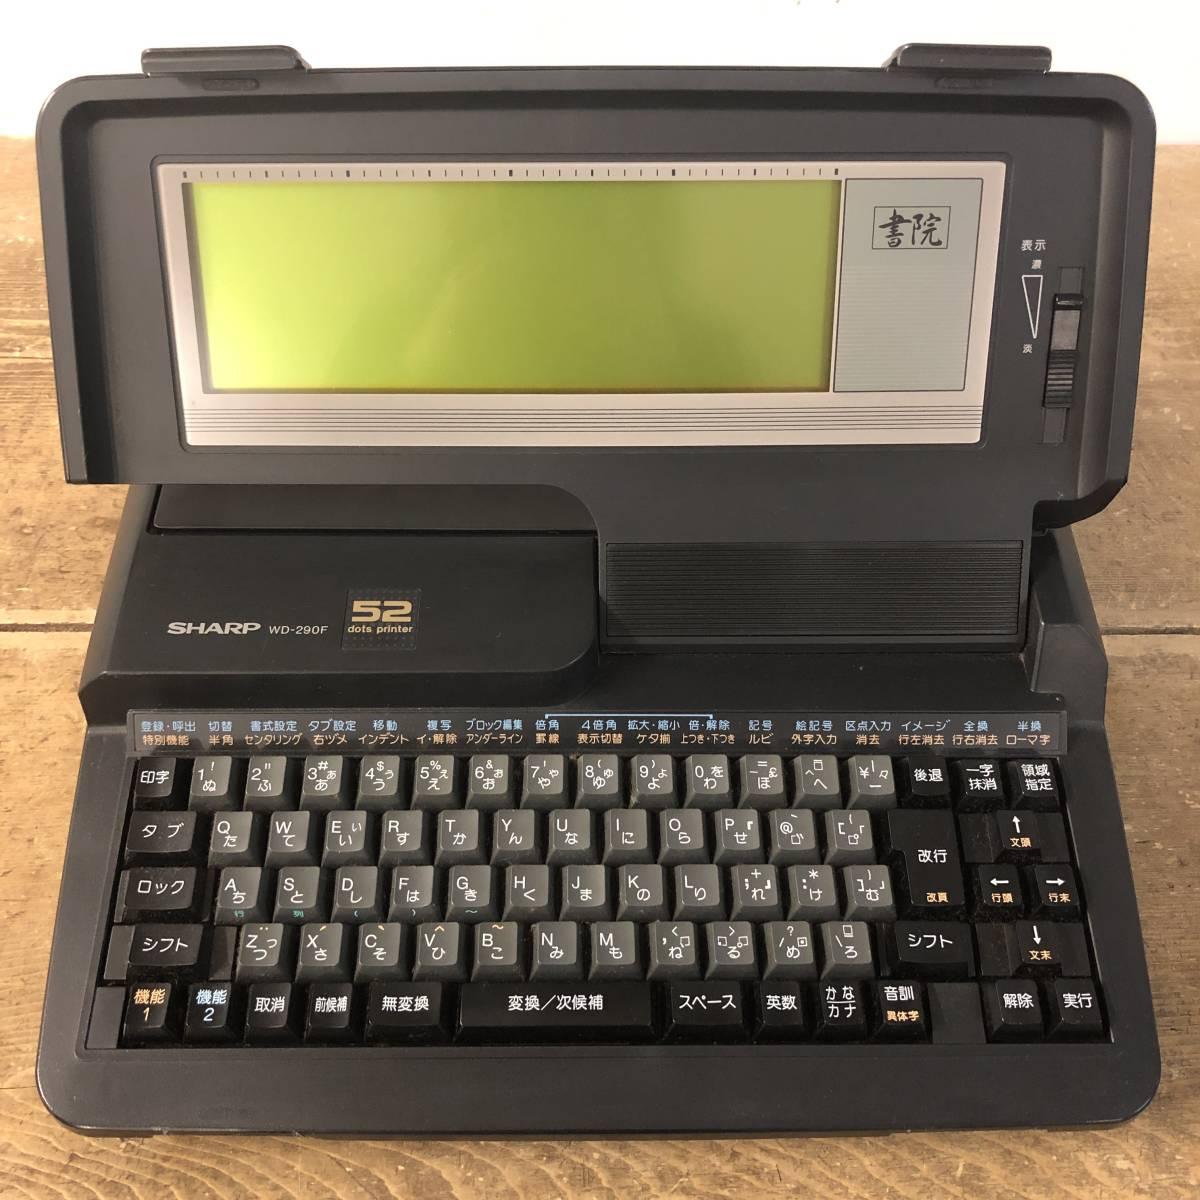 SHARP シャープ 日本語ワードプロセッサ 書院 WD-290W ワープロ 52ドットプリンター 取扱説明書 システムフロッピー 通電確認済 &_画像4